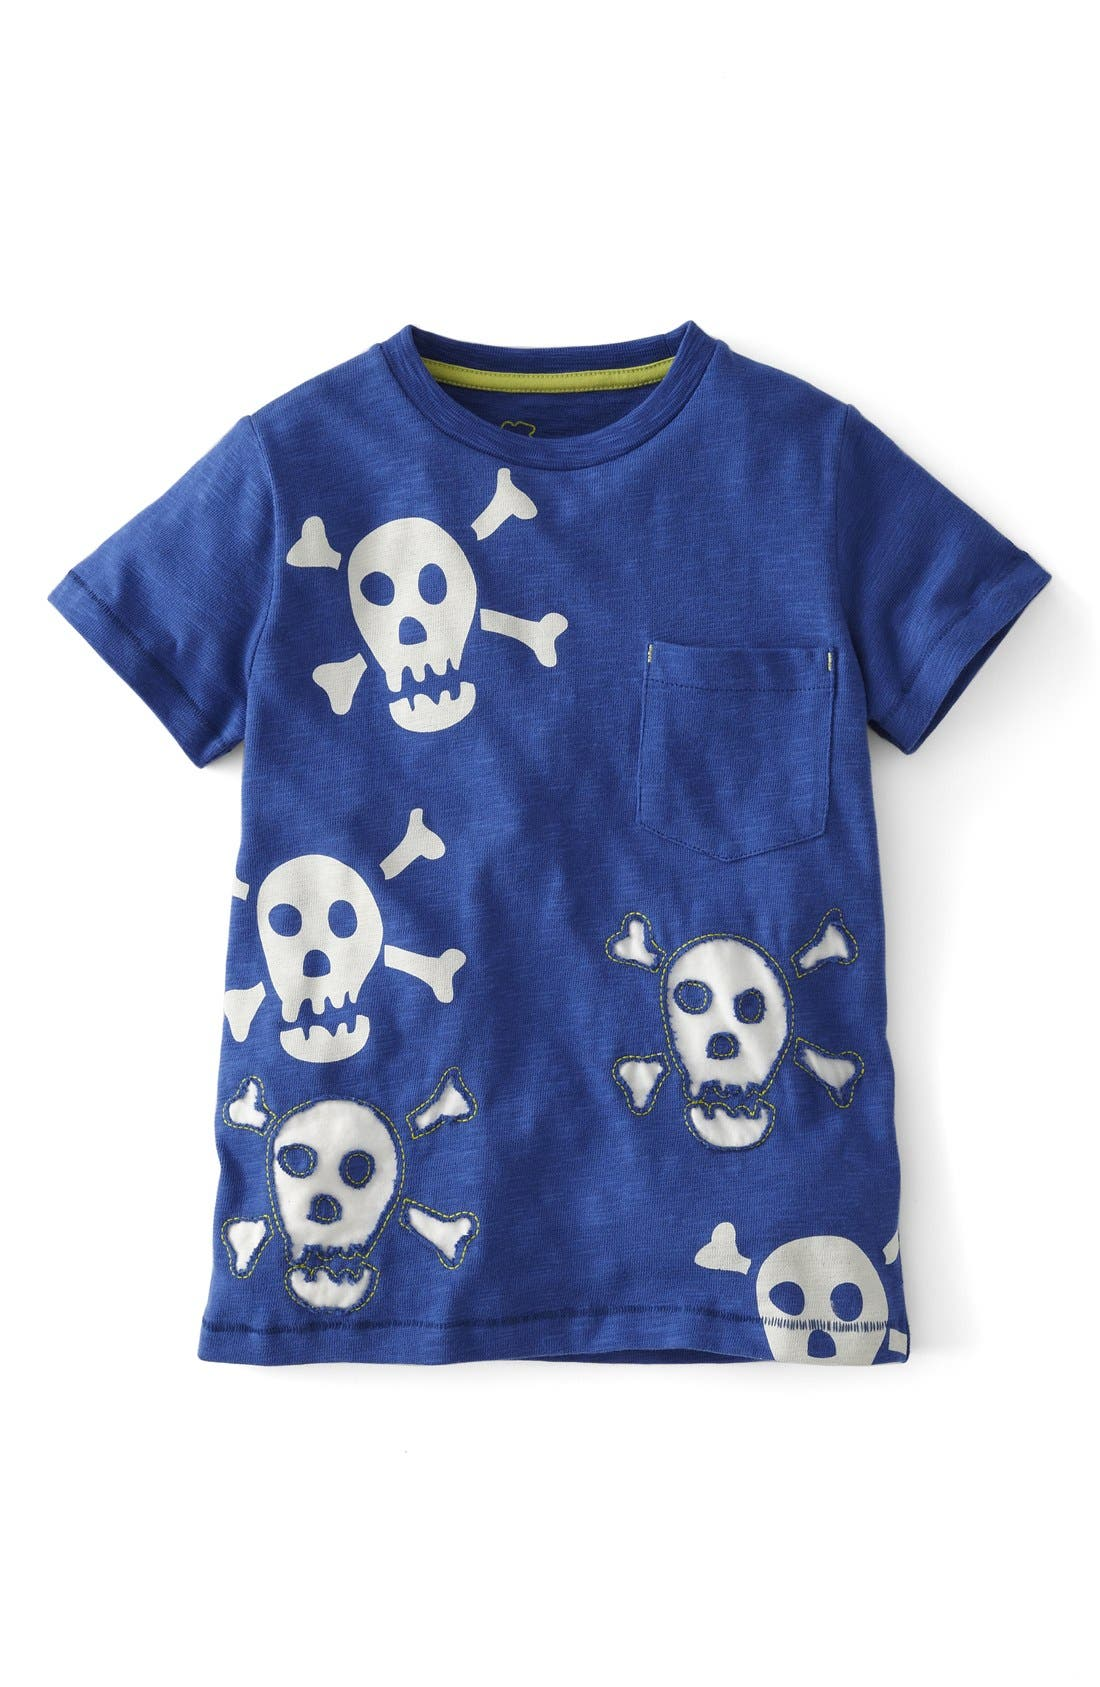 Main Image - Mini Boden 'Reverse Appliqué' T-Shirt (Toddler Boys, Little Boys & Big Boys)